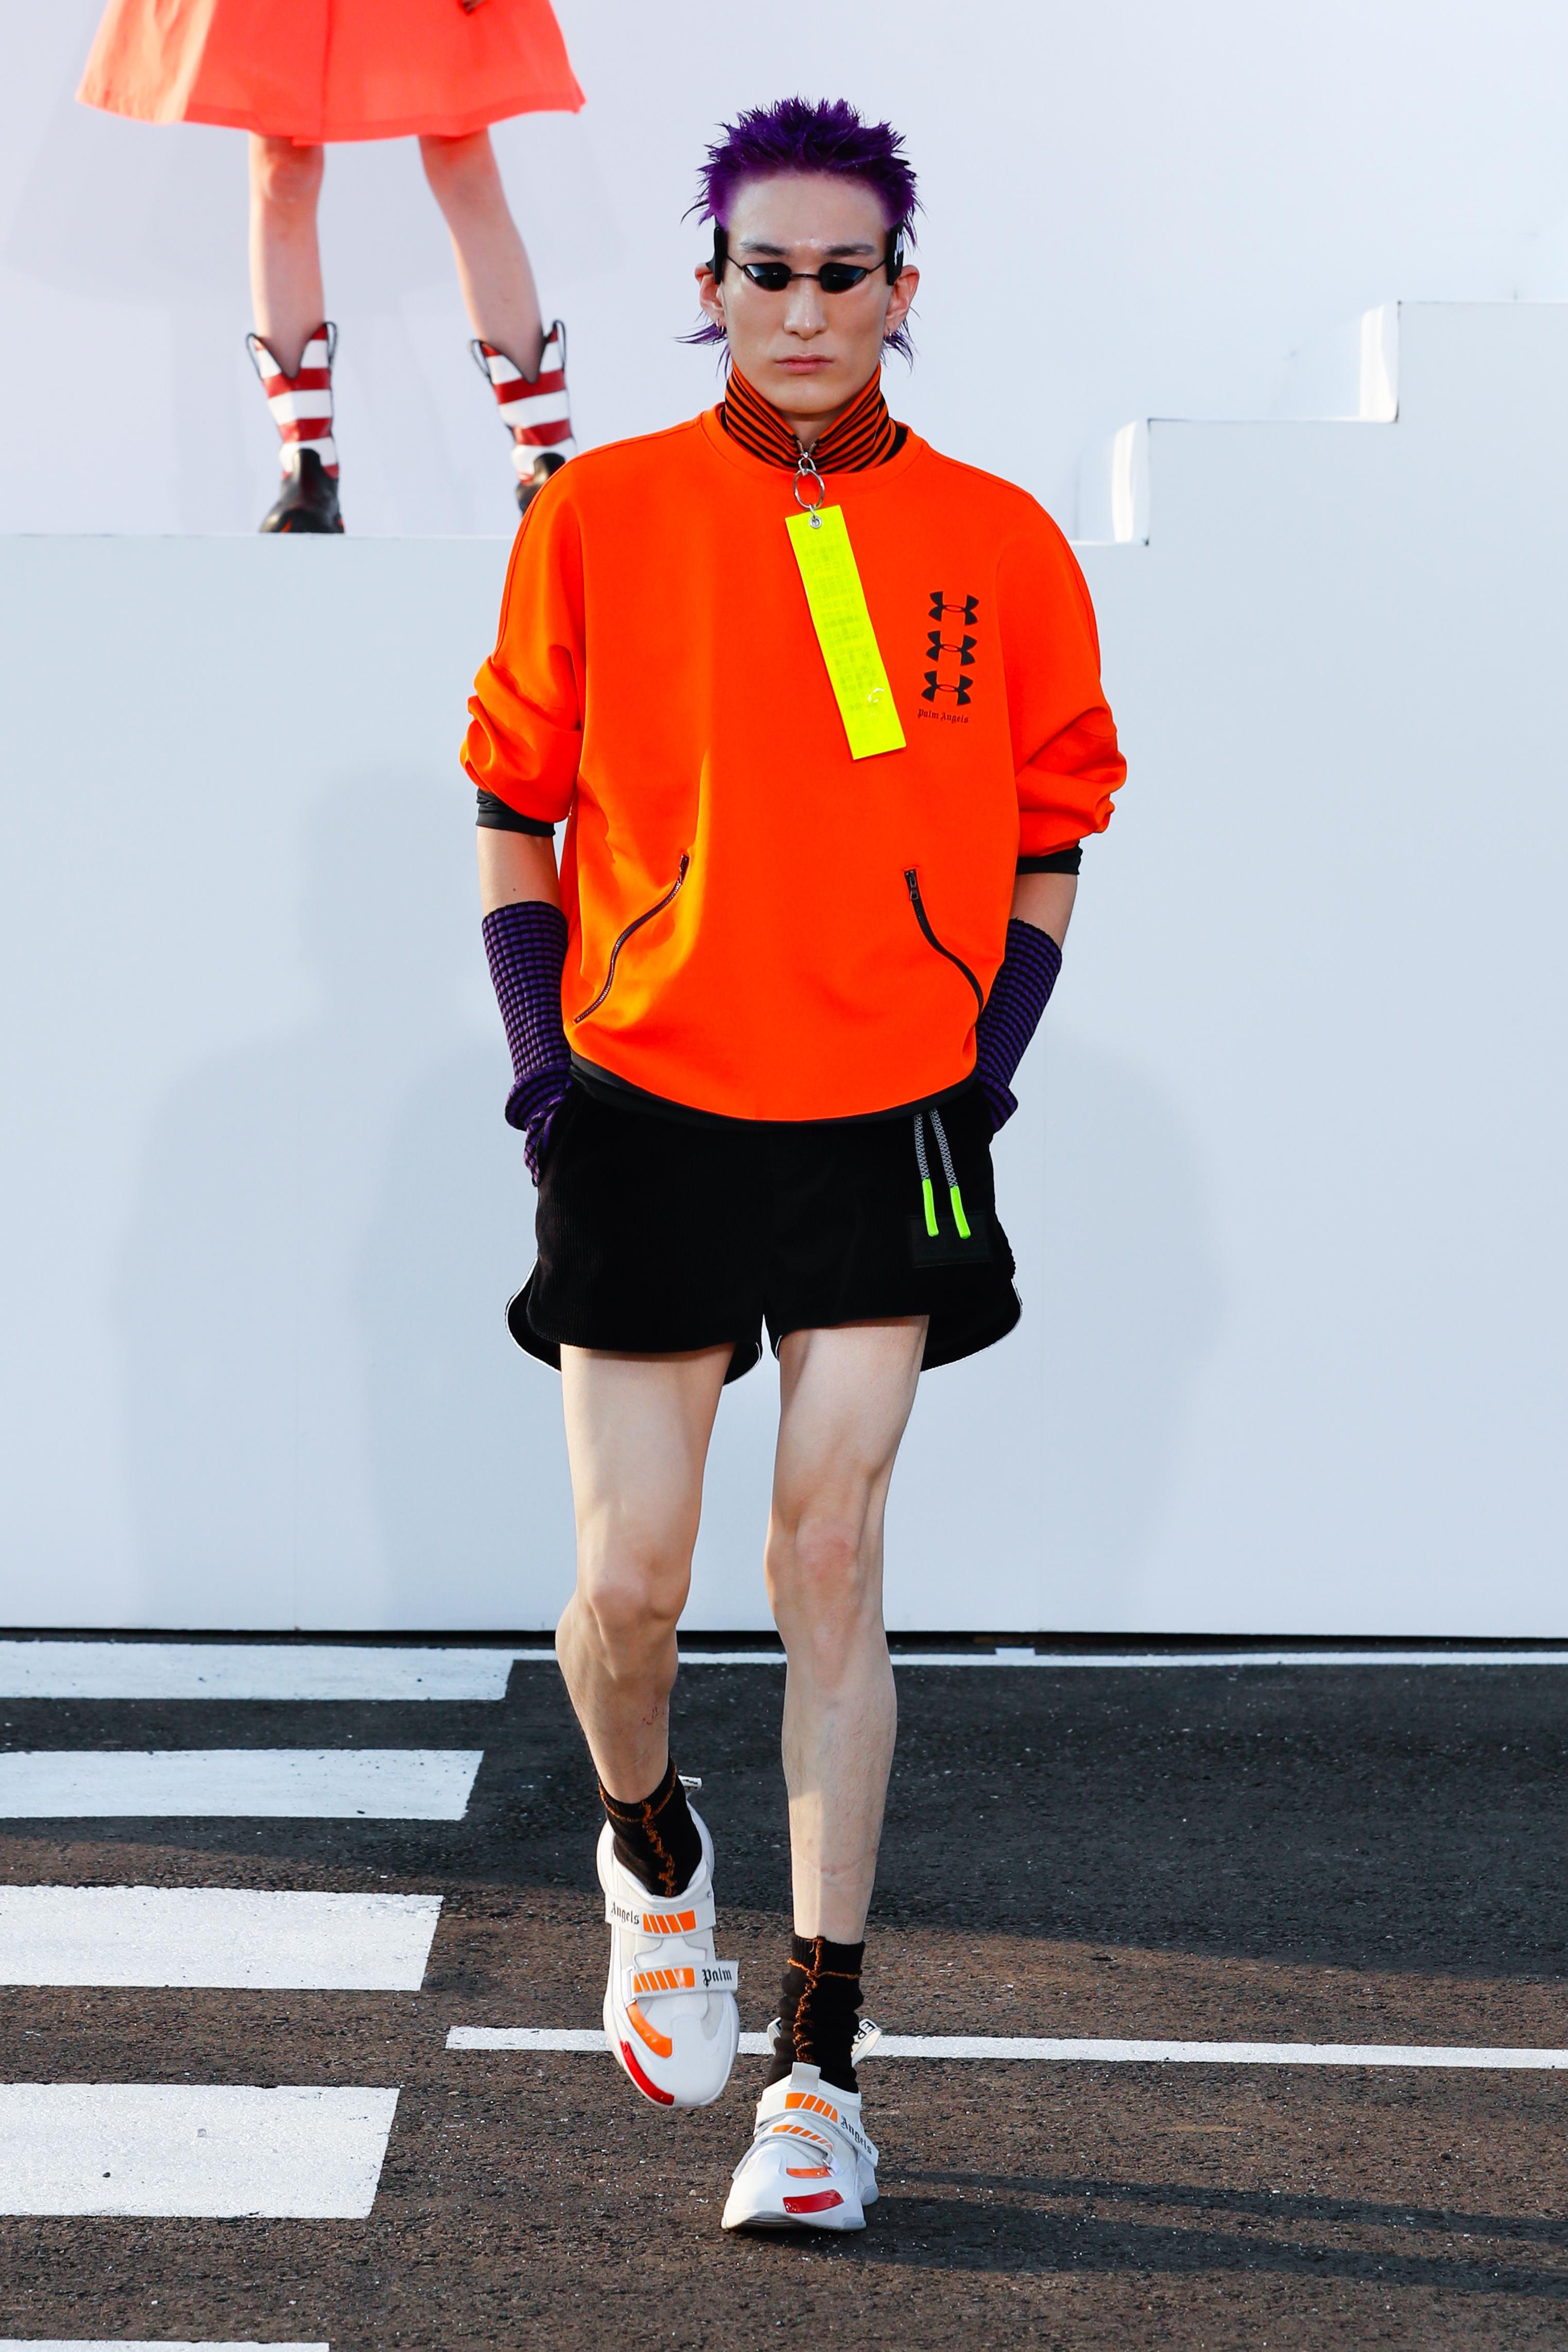 soldadura ballena Desaparecido  The Under Armour x Palm Angels Collab Made Its Debut At Milan Fashion Week  • KicksOnFire.com